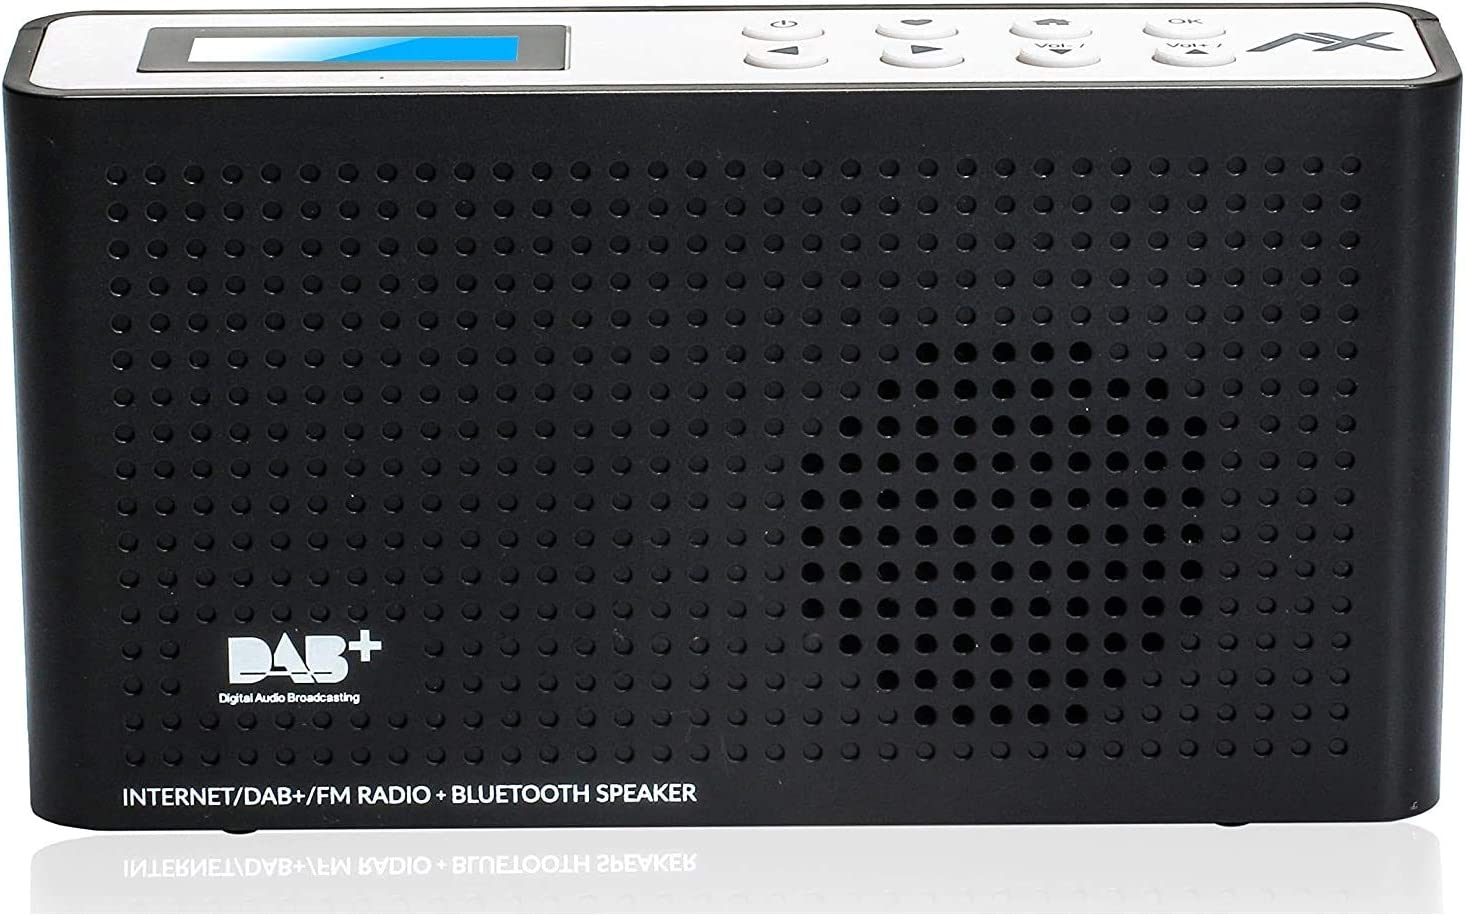 Anadol Ax 4in1 Radio Tragbares Internetradio Dab Elektronik